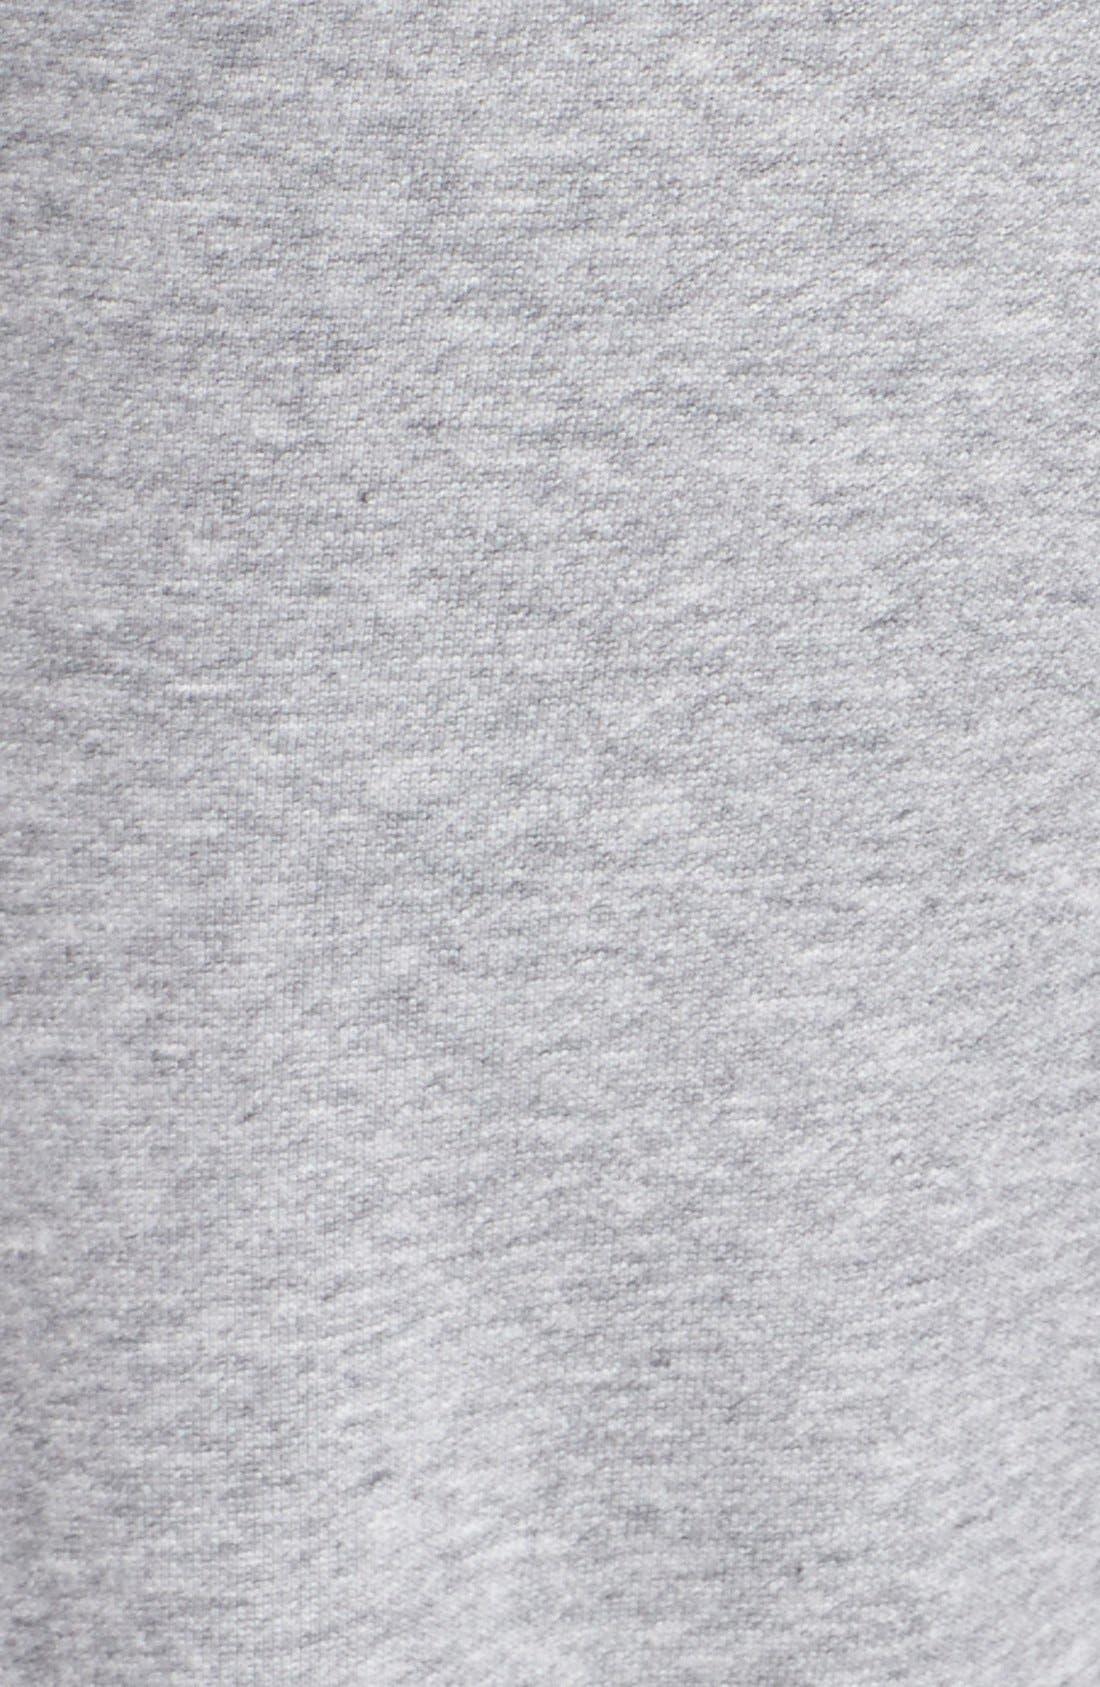 Alternate Image 4  - adidas by Stella McCartney 'Ess' Organic Cotton Sweatpants